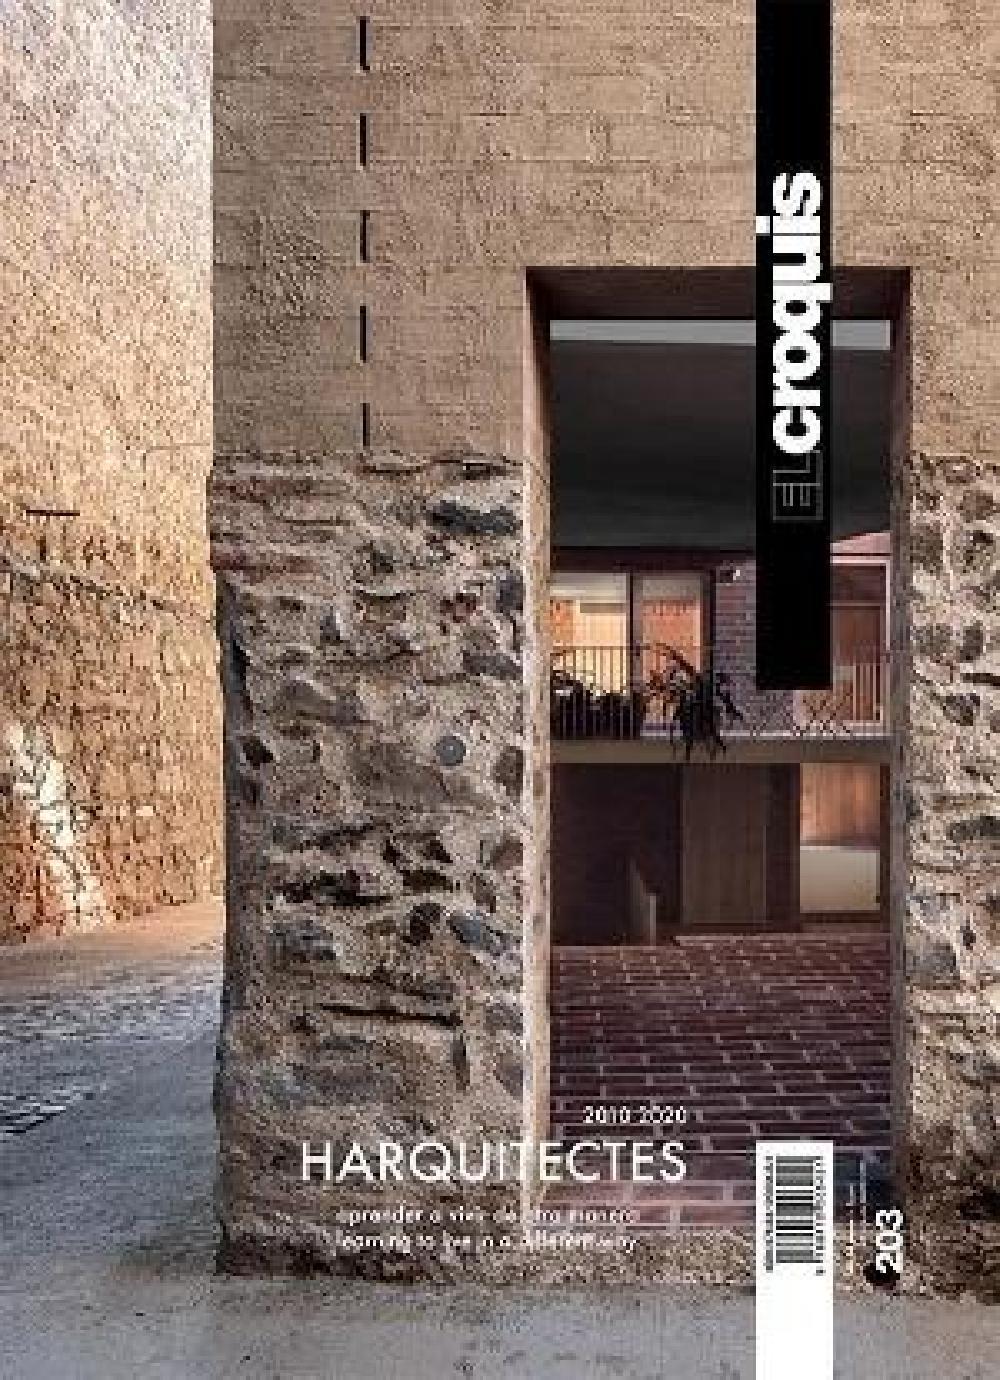 El Croquis - Harquitectes 2010-2020